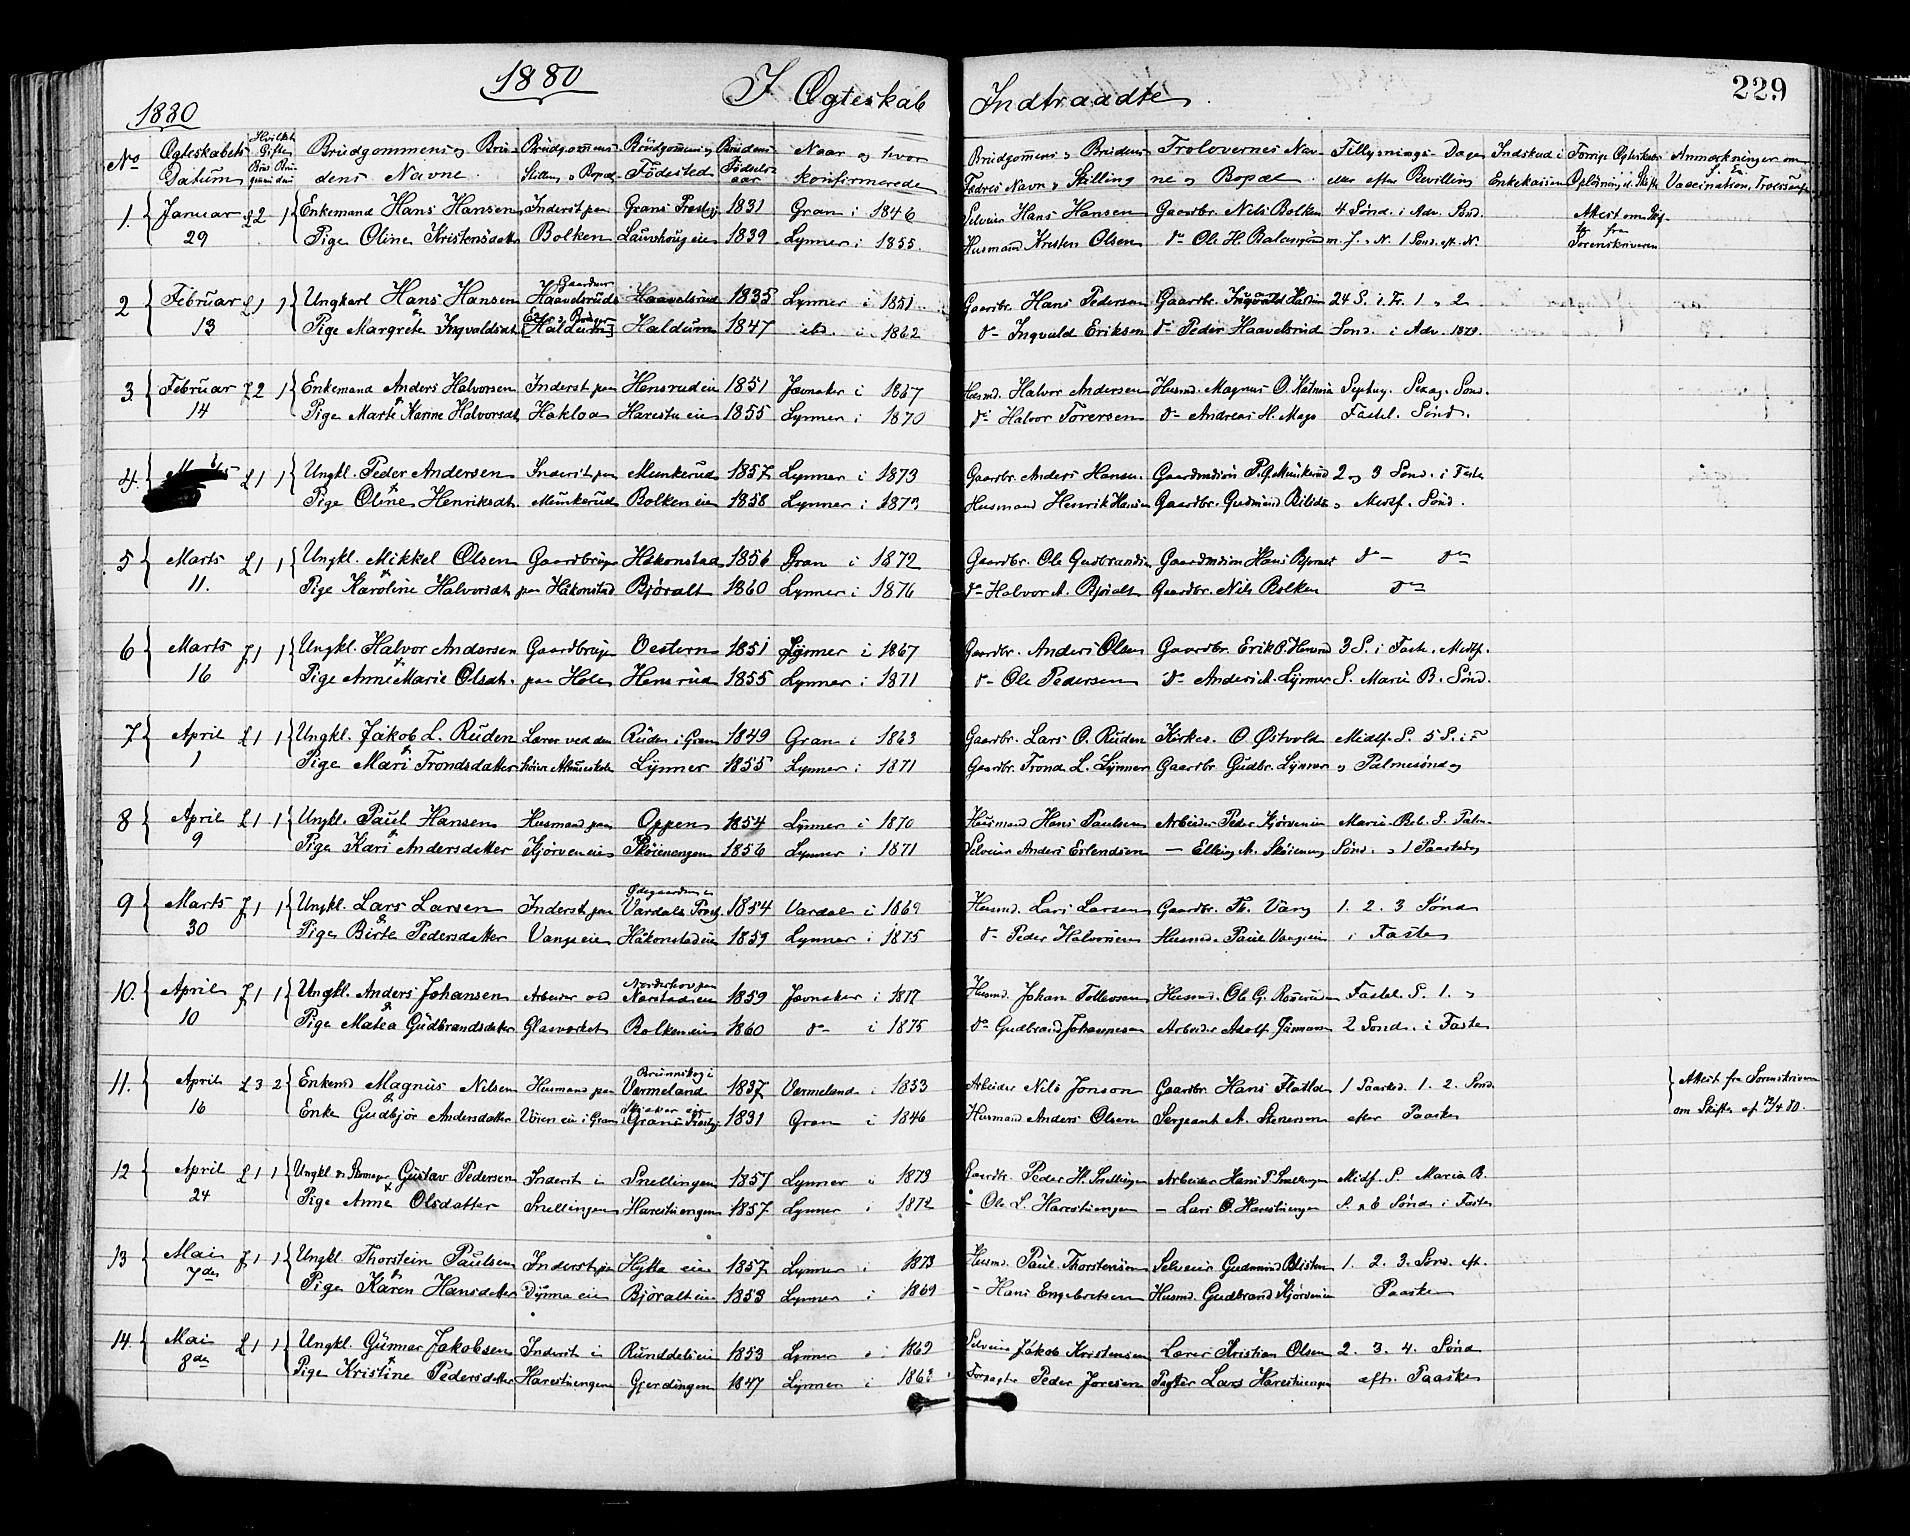 SAH, Jevnaker prestekontor, Ministerialbok nr. 8, 1877-1890, s. 229